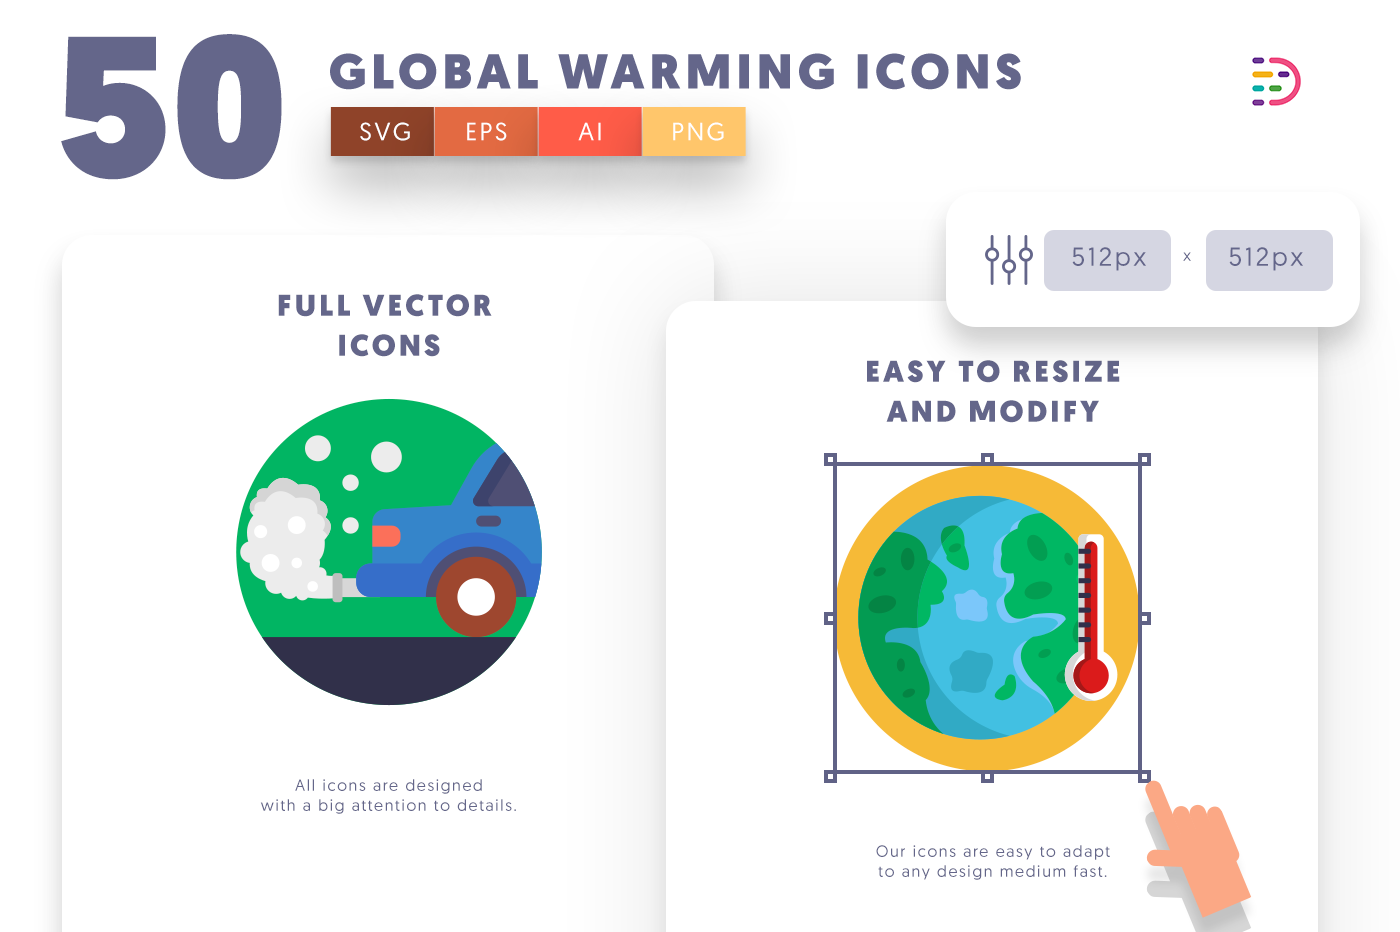 Full vector 50GlobalWarming Icons